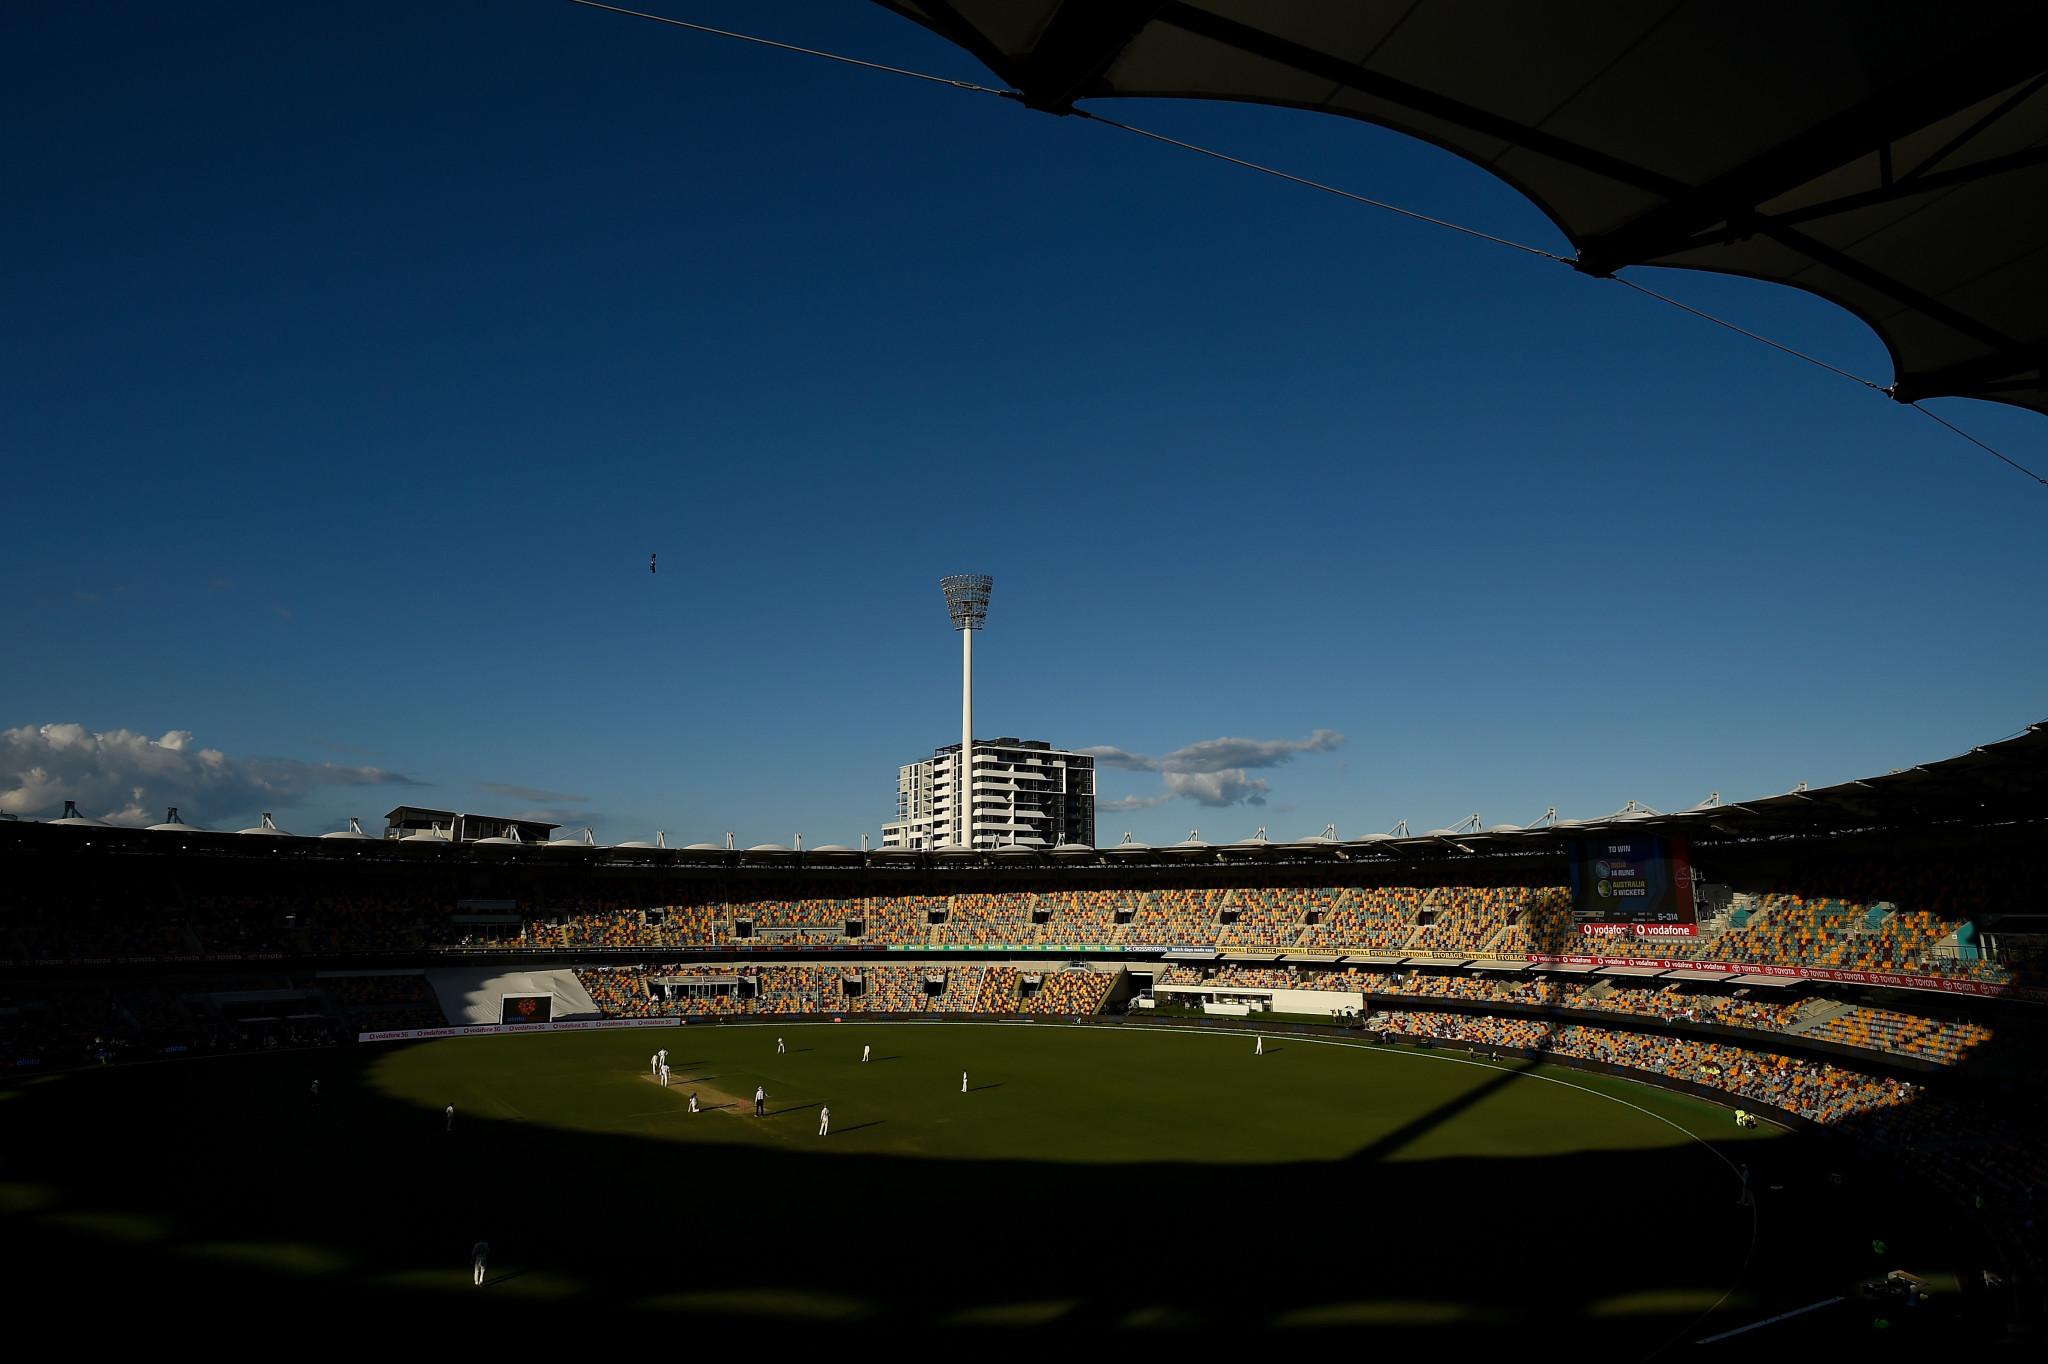 Rebuilt Gabba proposed as focal venue of Brisbane 2032